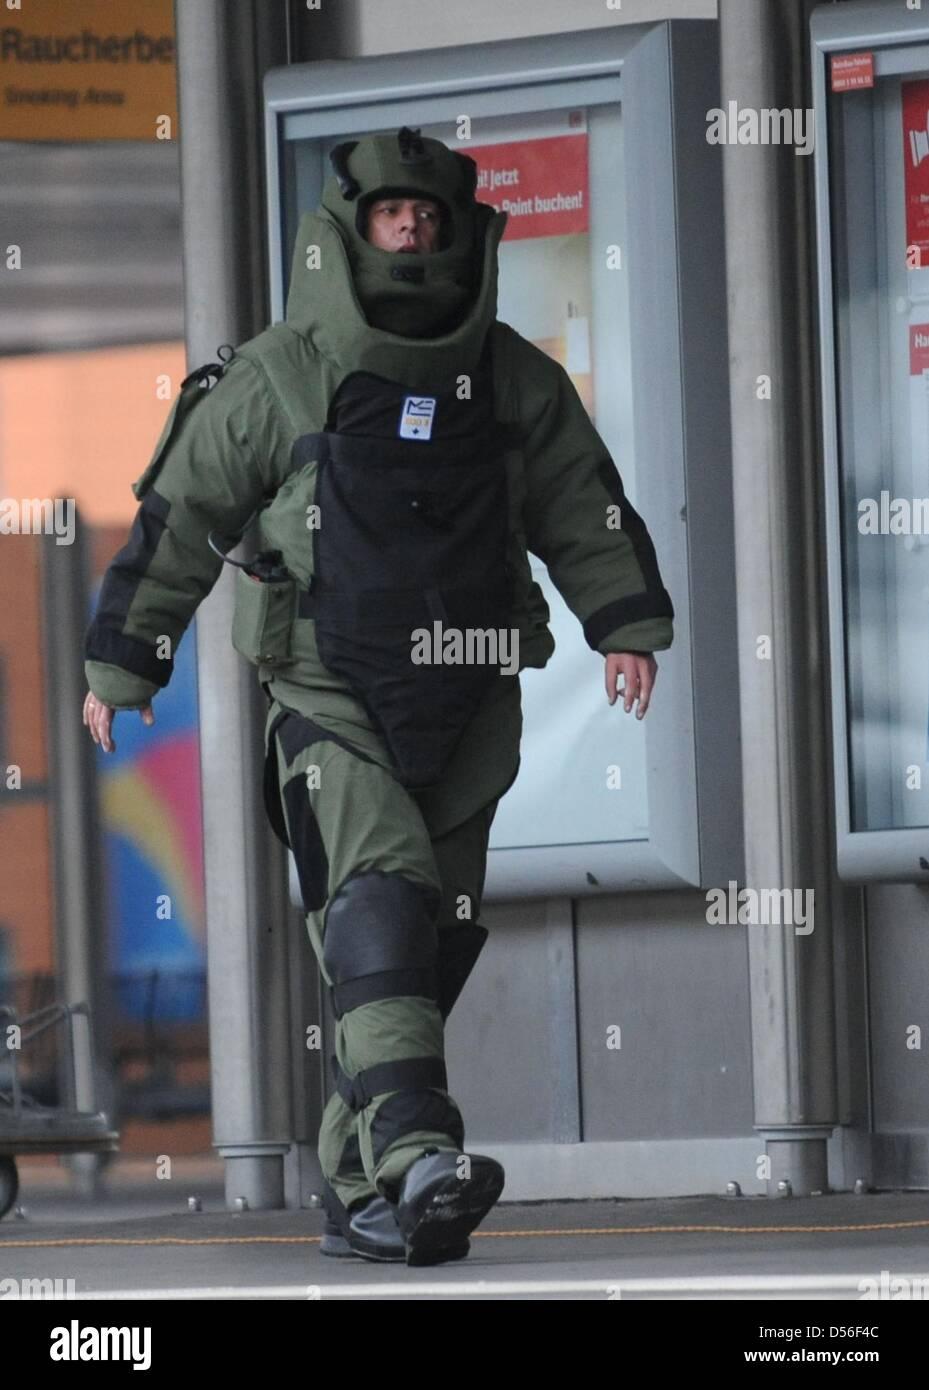 Sprengstoff Hannover